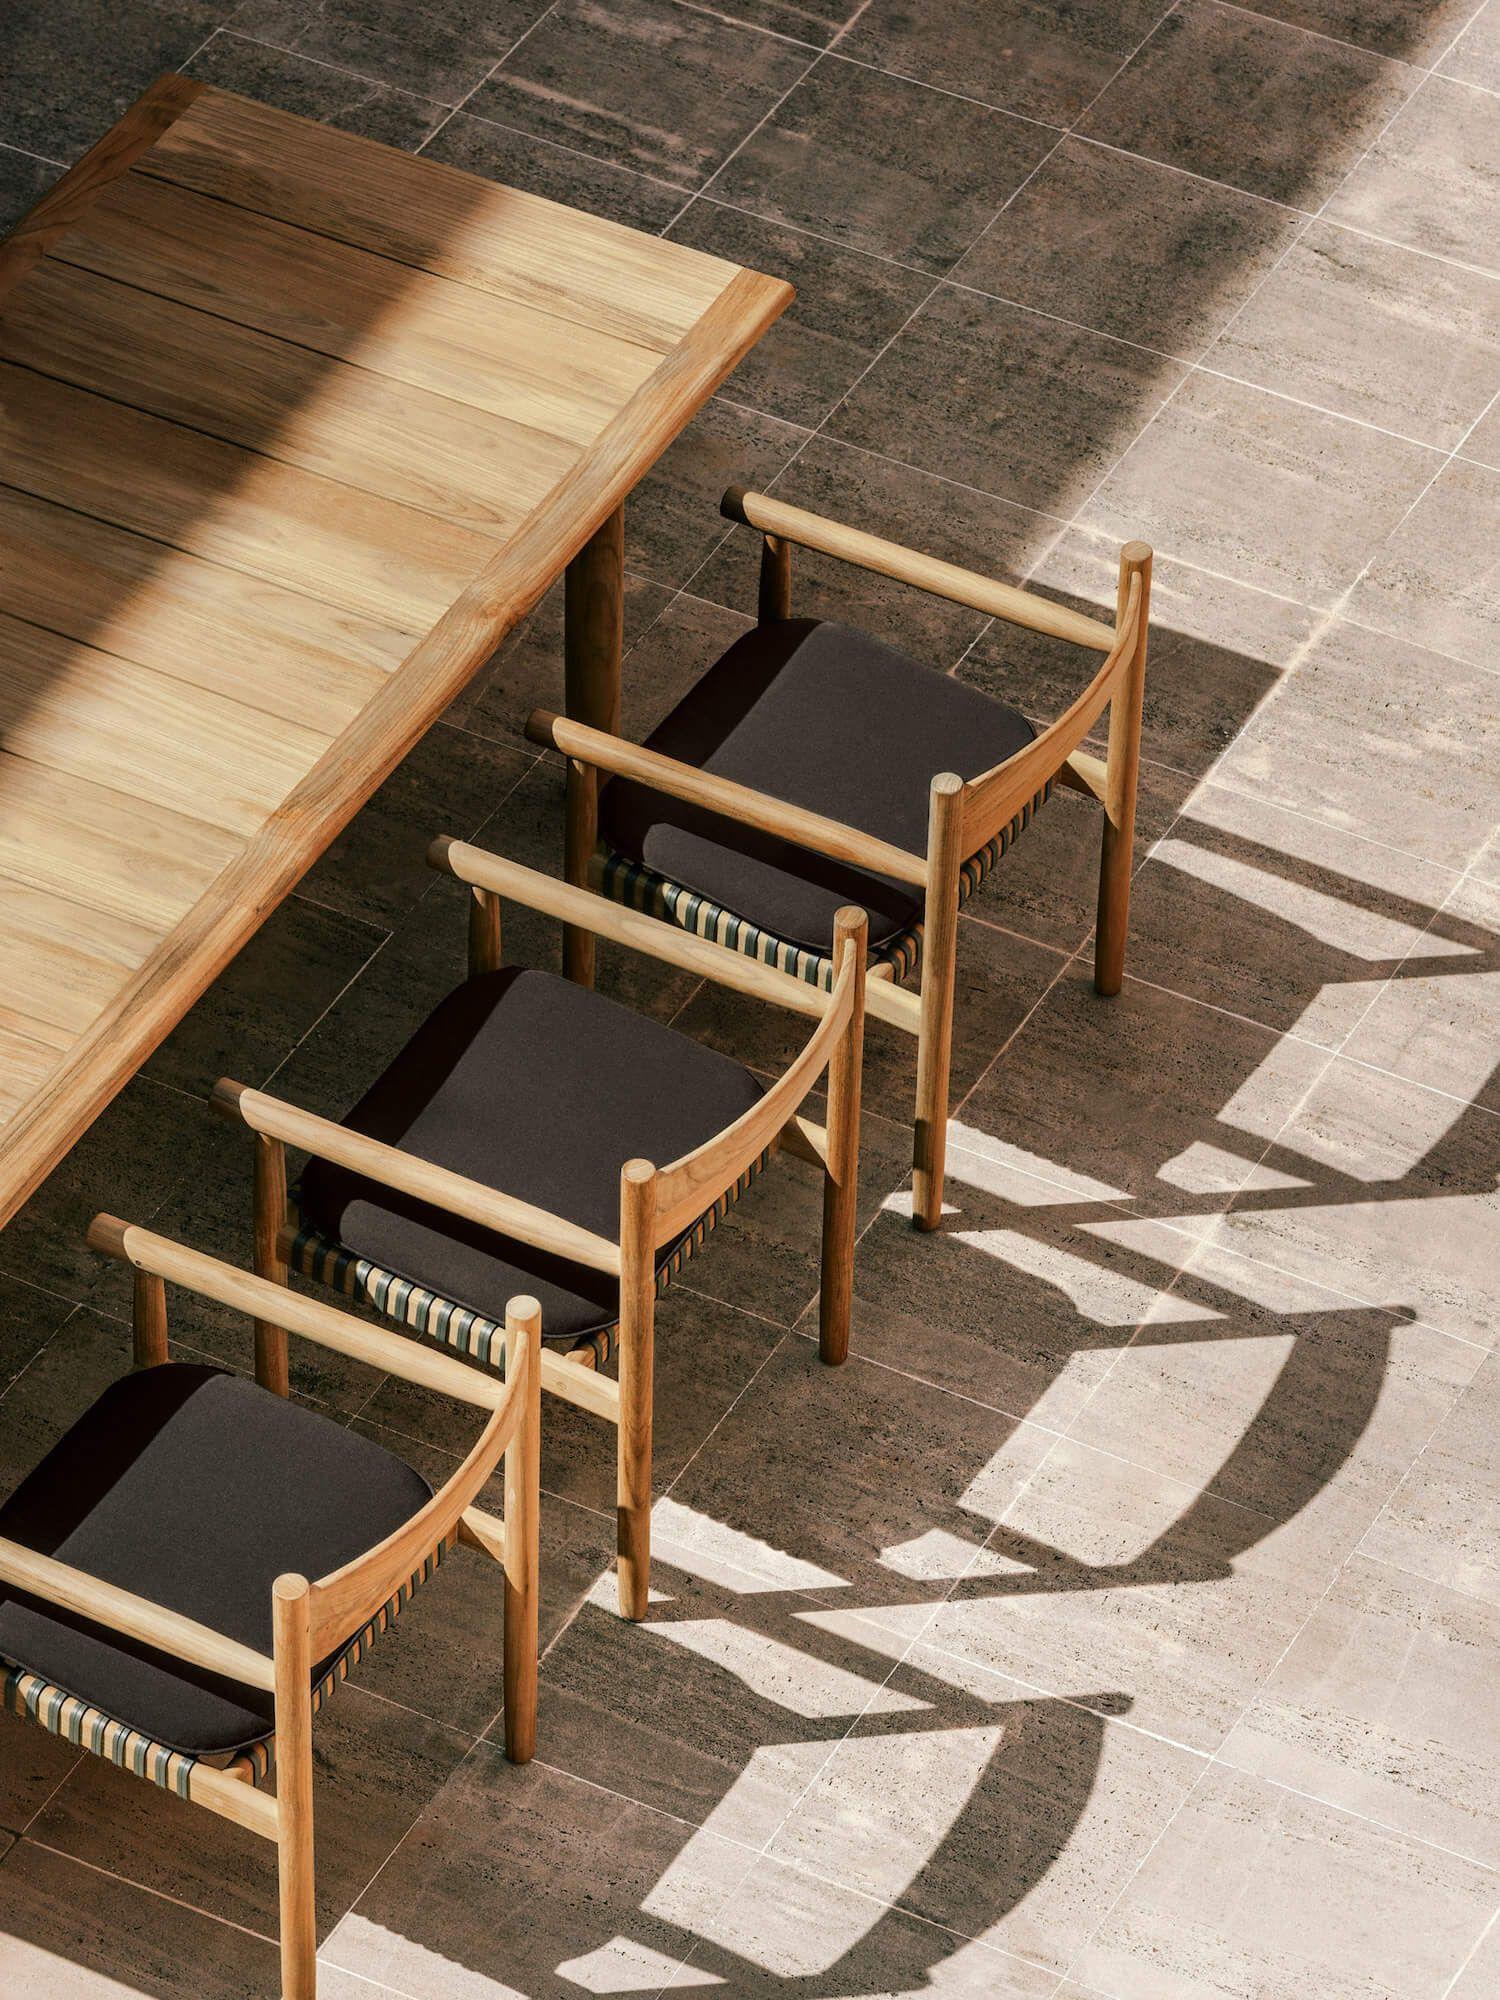 Dedon Outdoor Collection At Cosh Living Dedon Furniture Furniture Design Furniture